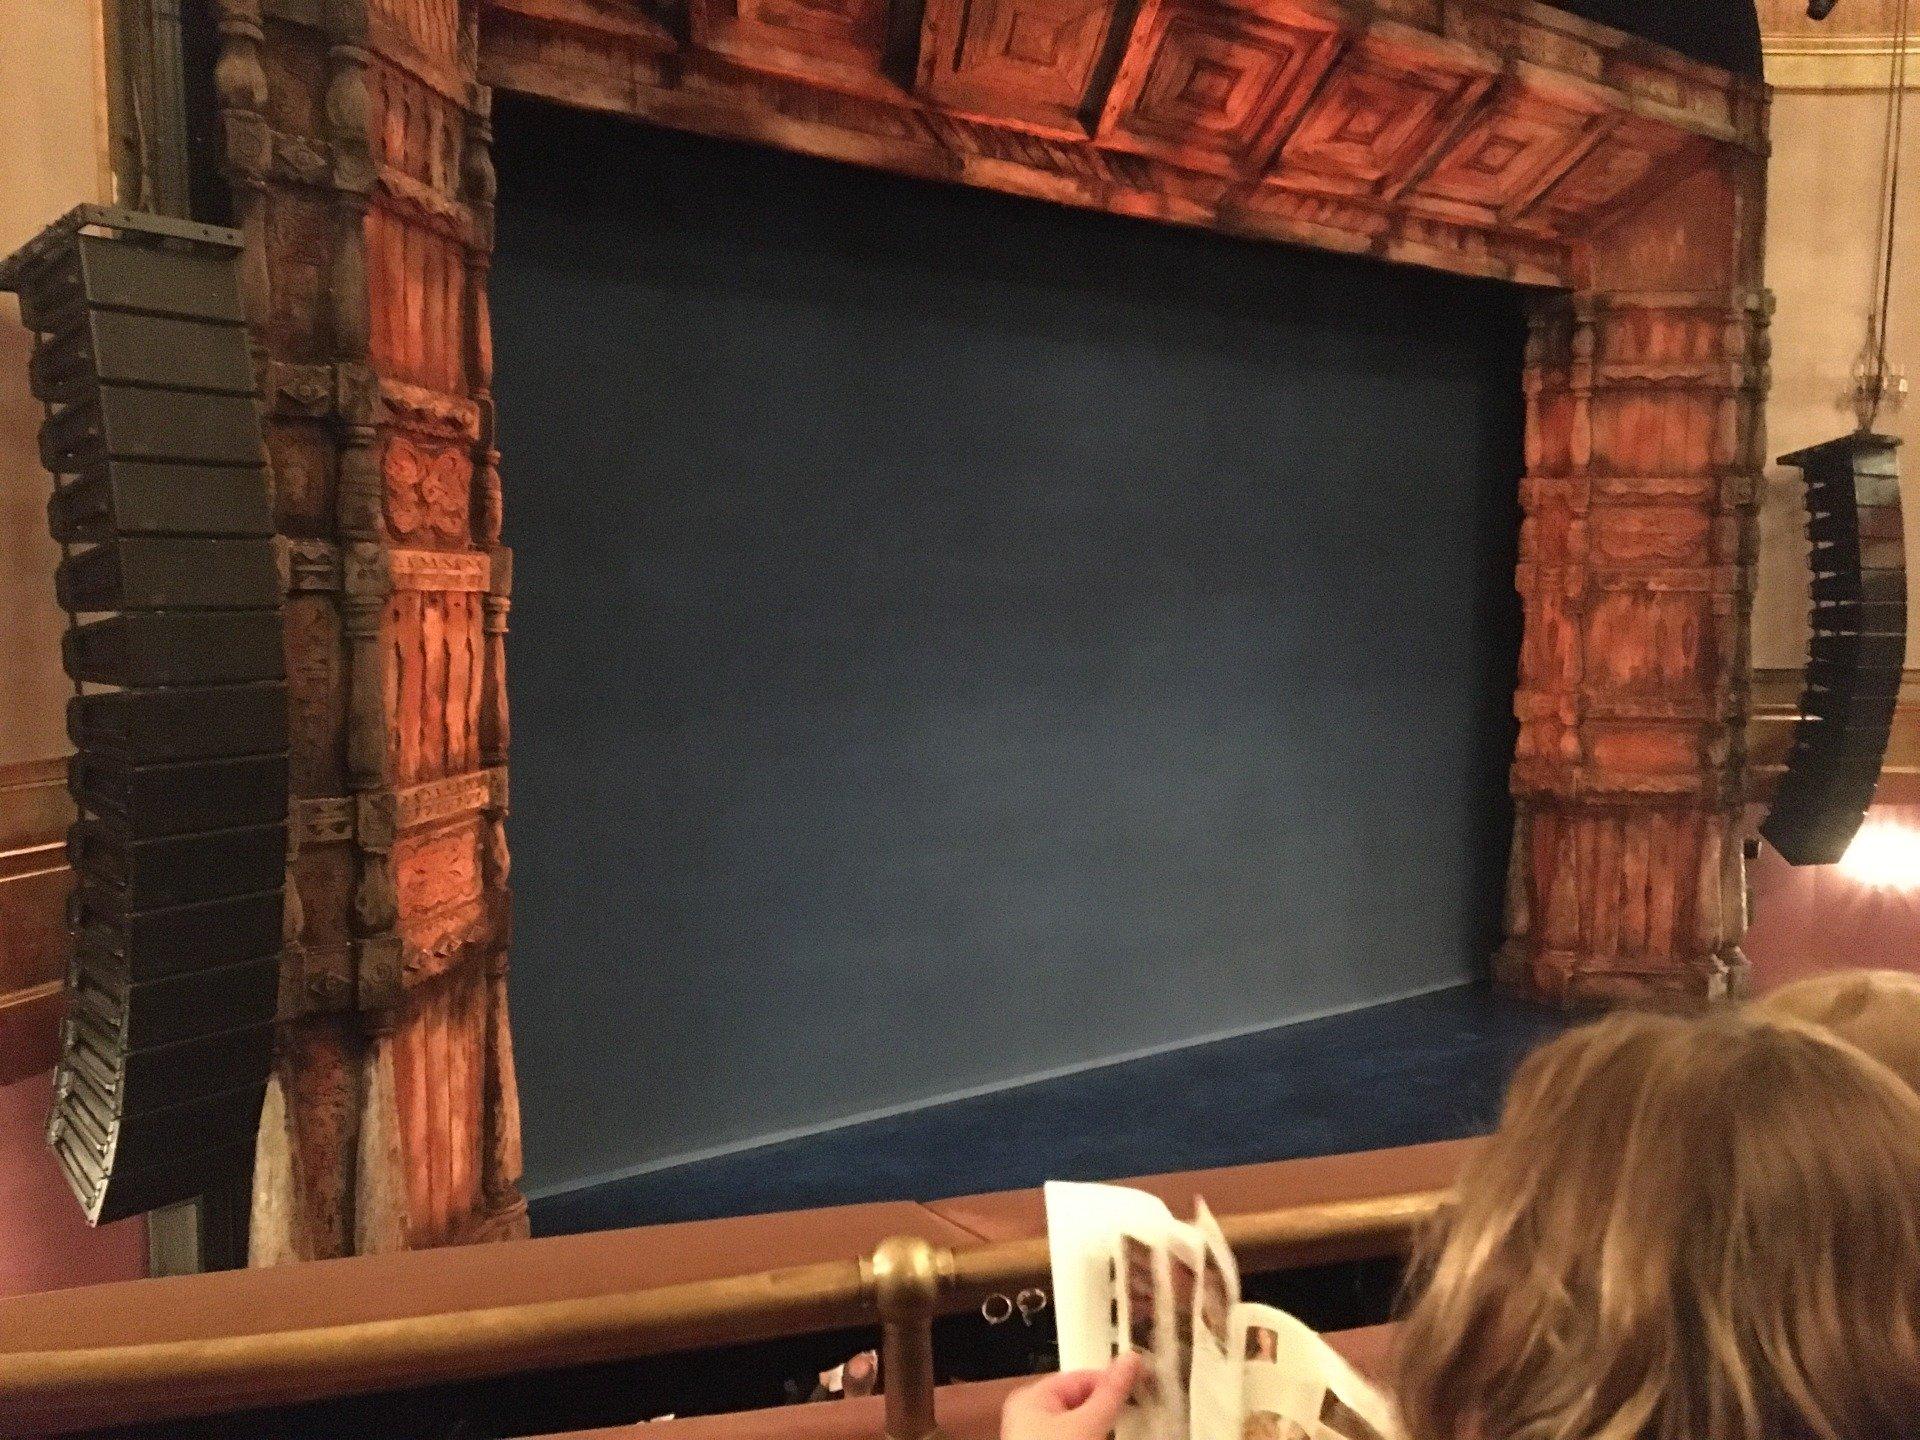 St. James Theatre Section Mezzanine L Row B Seat 17